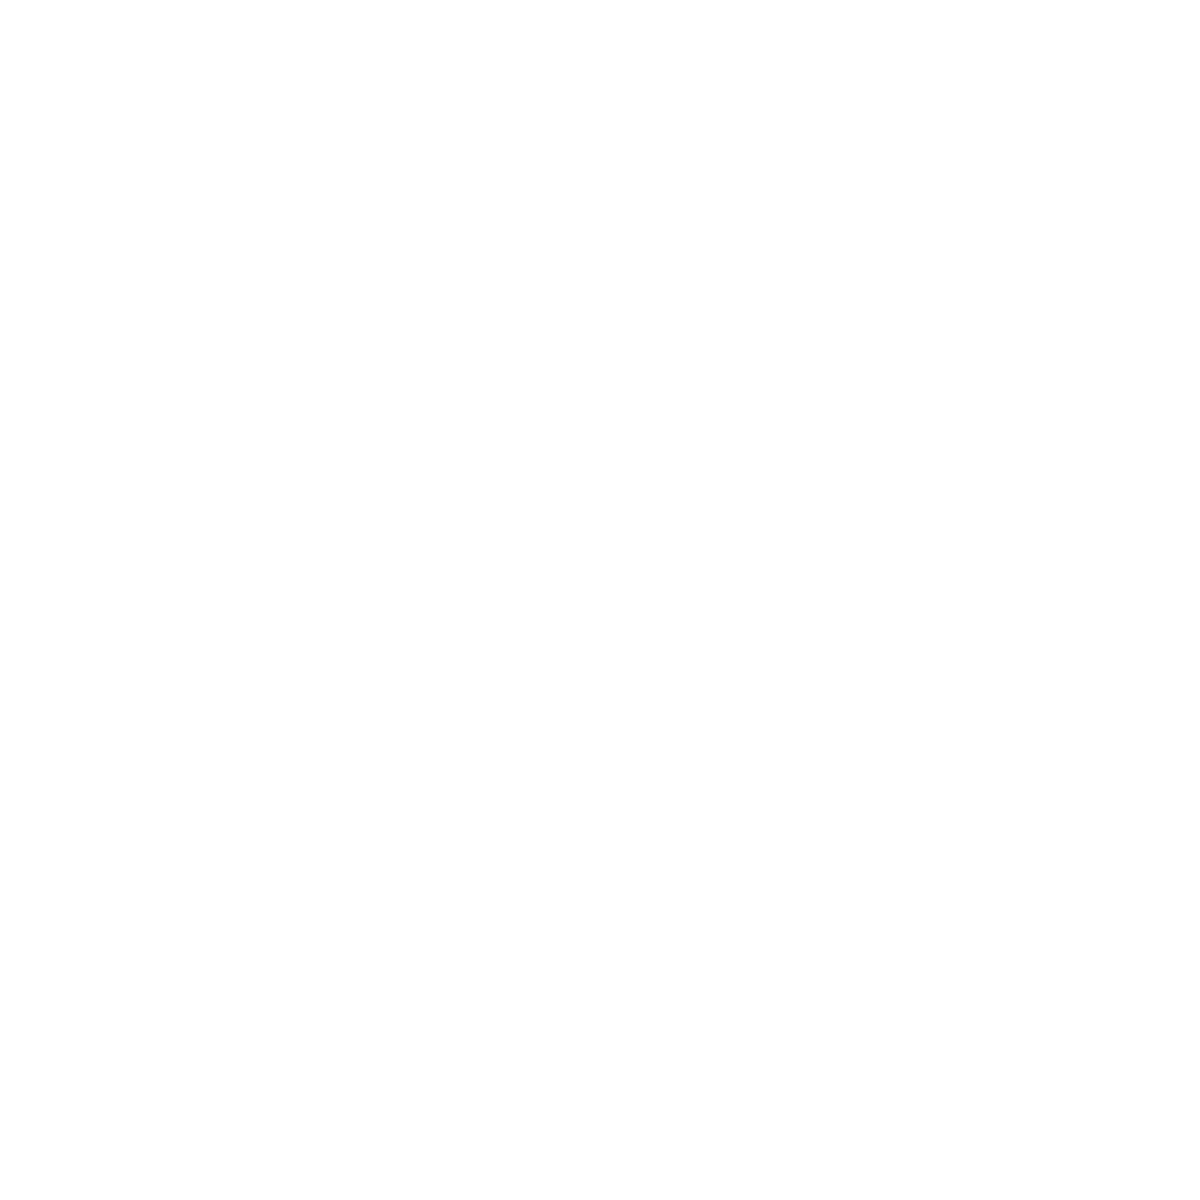 49th State, 49th State Brewing, 49th State Brewery, 49th State Brewing Co, 49th State Brewing Company, Denali, Denali Park, Denali National Park, DNP, Denali brewery, Denali brewpub, Denali restaurant, Alaska restaurant, Alaska brewery